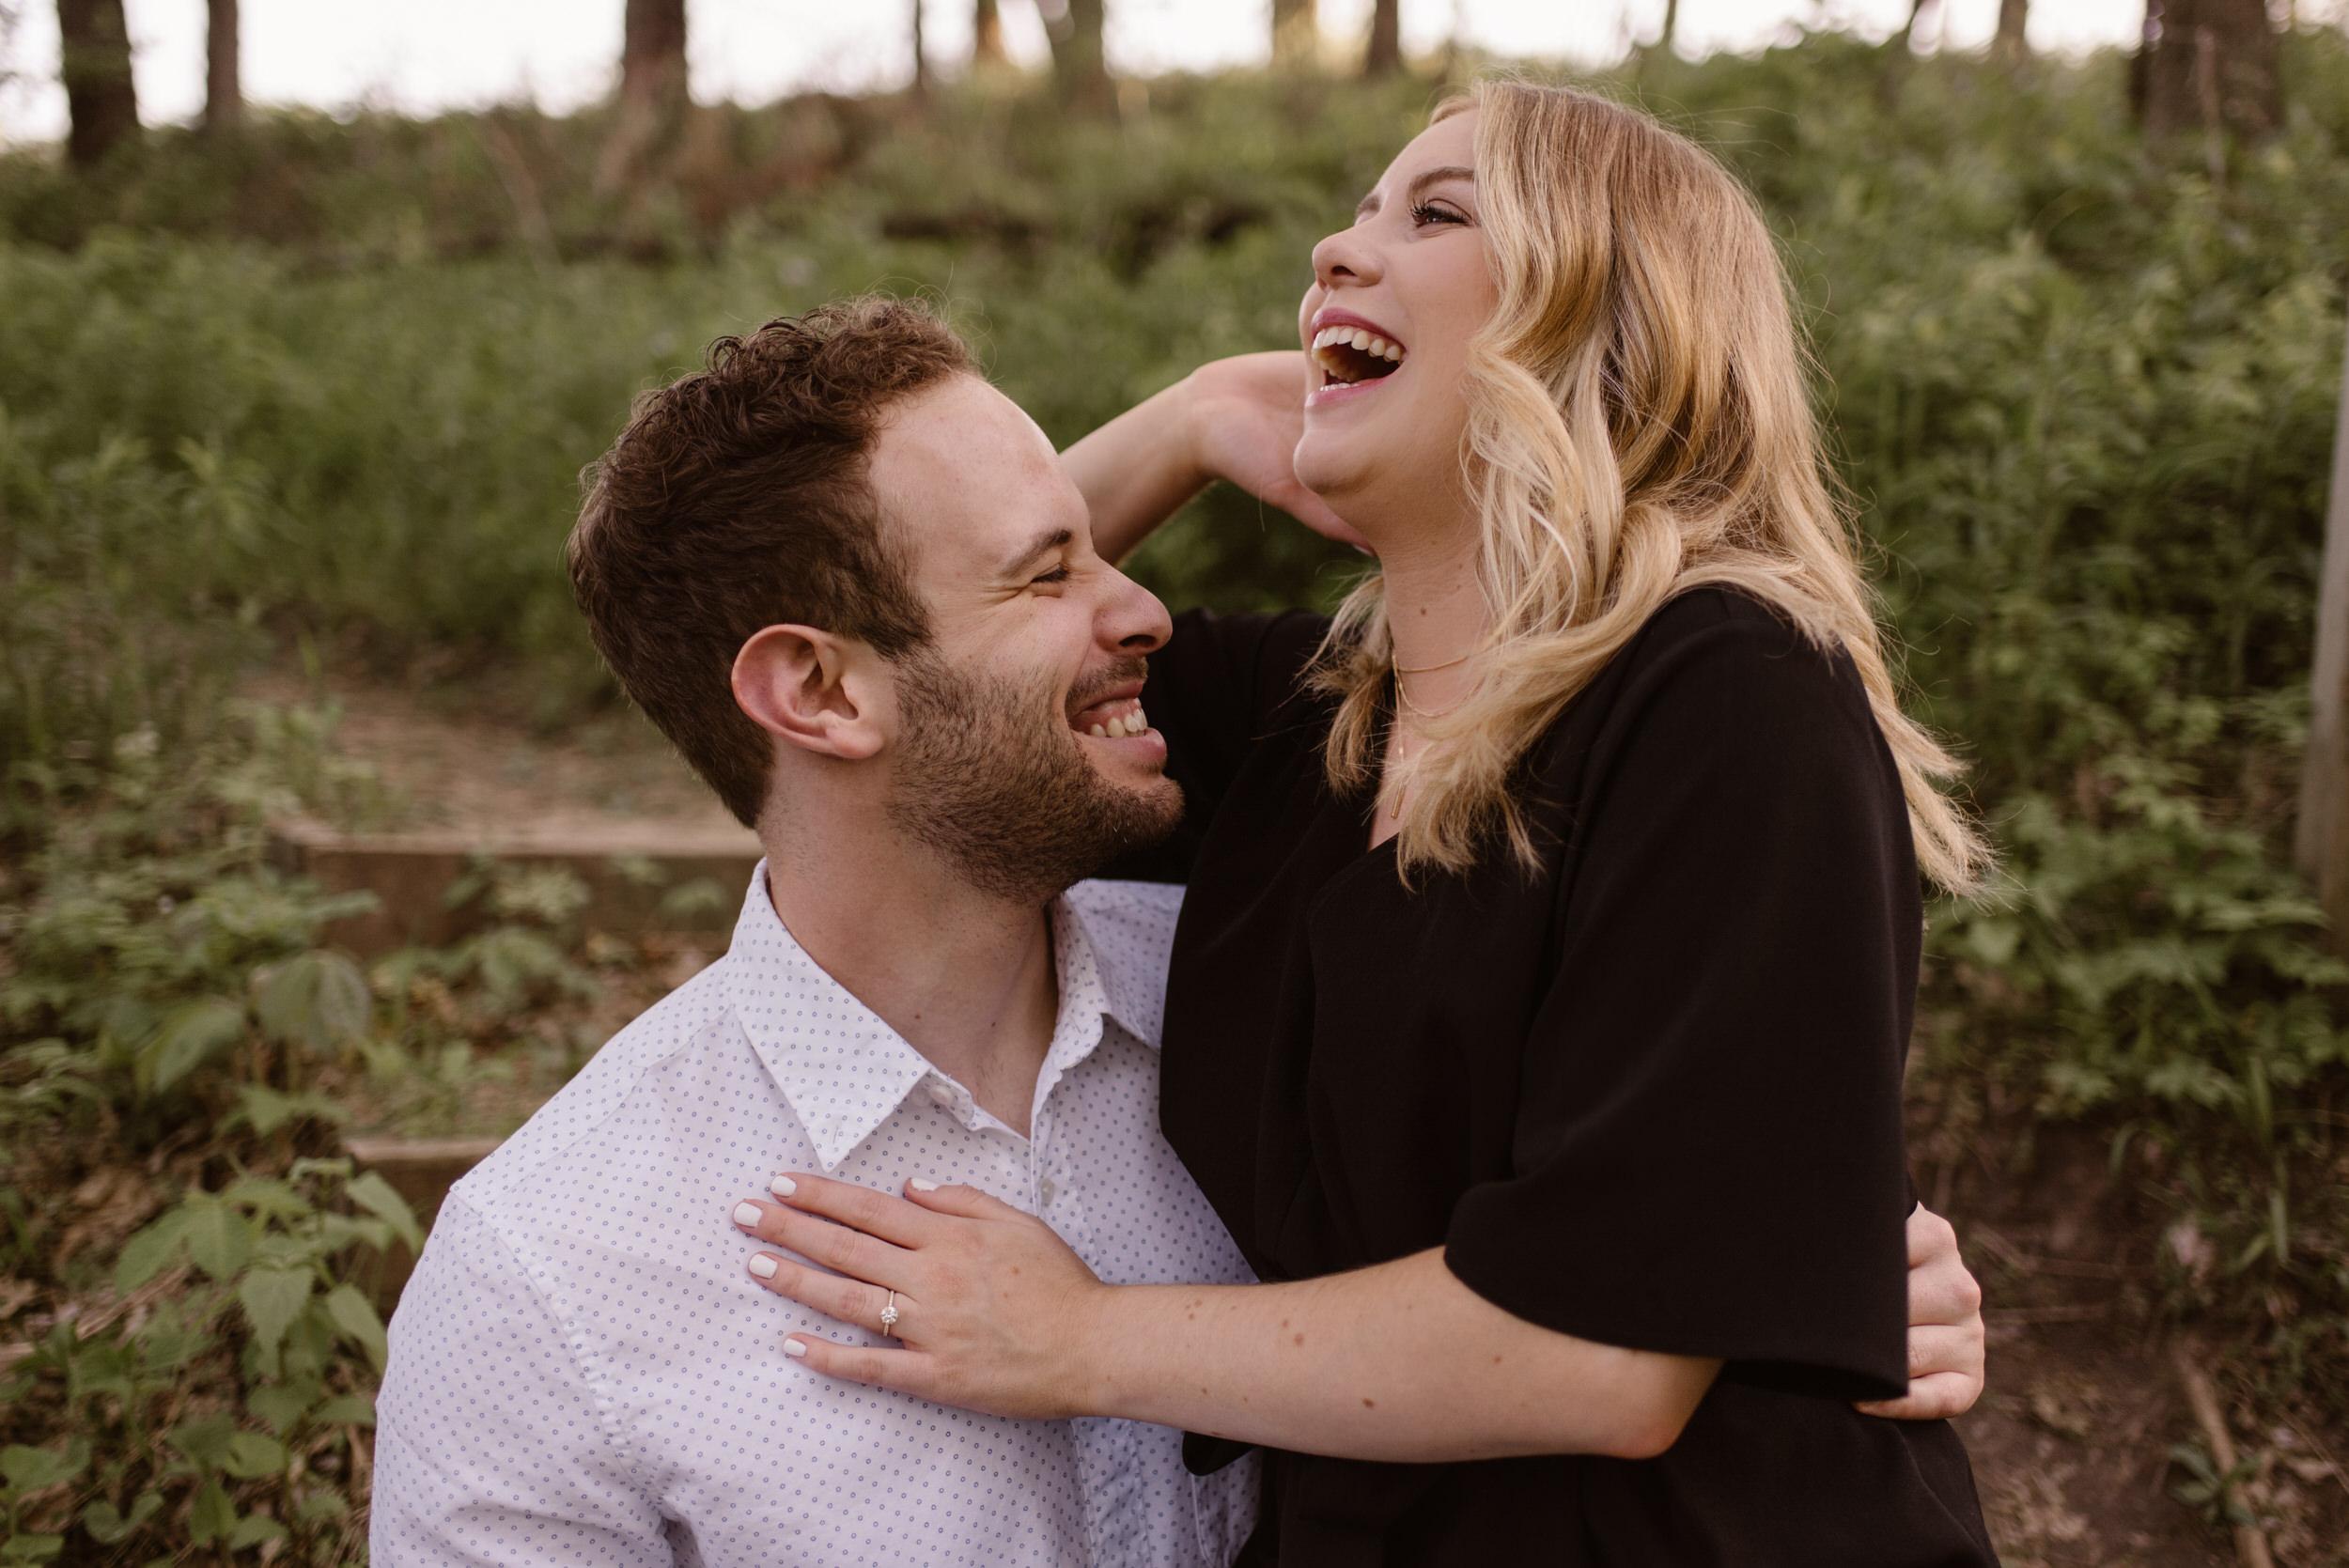 Omaha-Nebraska-Engagement-Session-Kaylie-Sirek-Photography-114.jpg